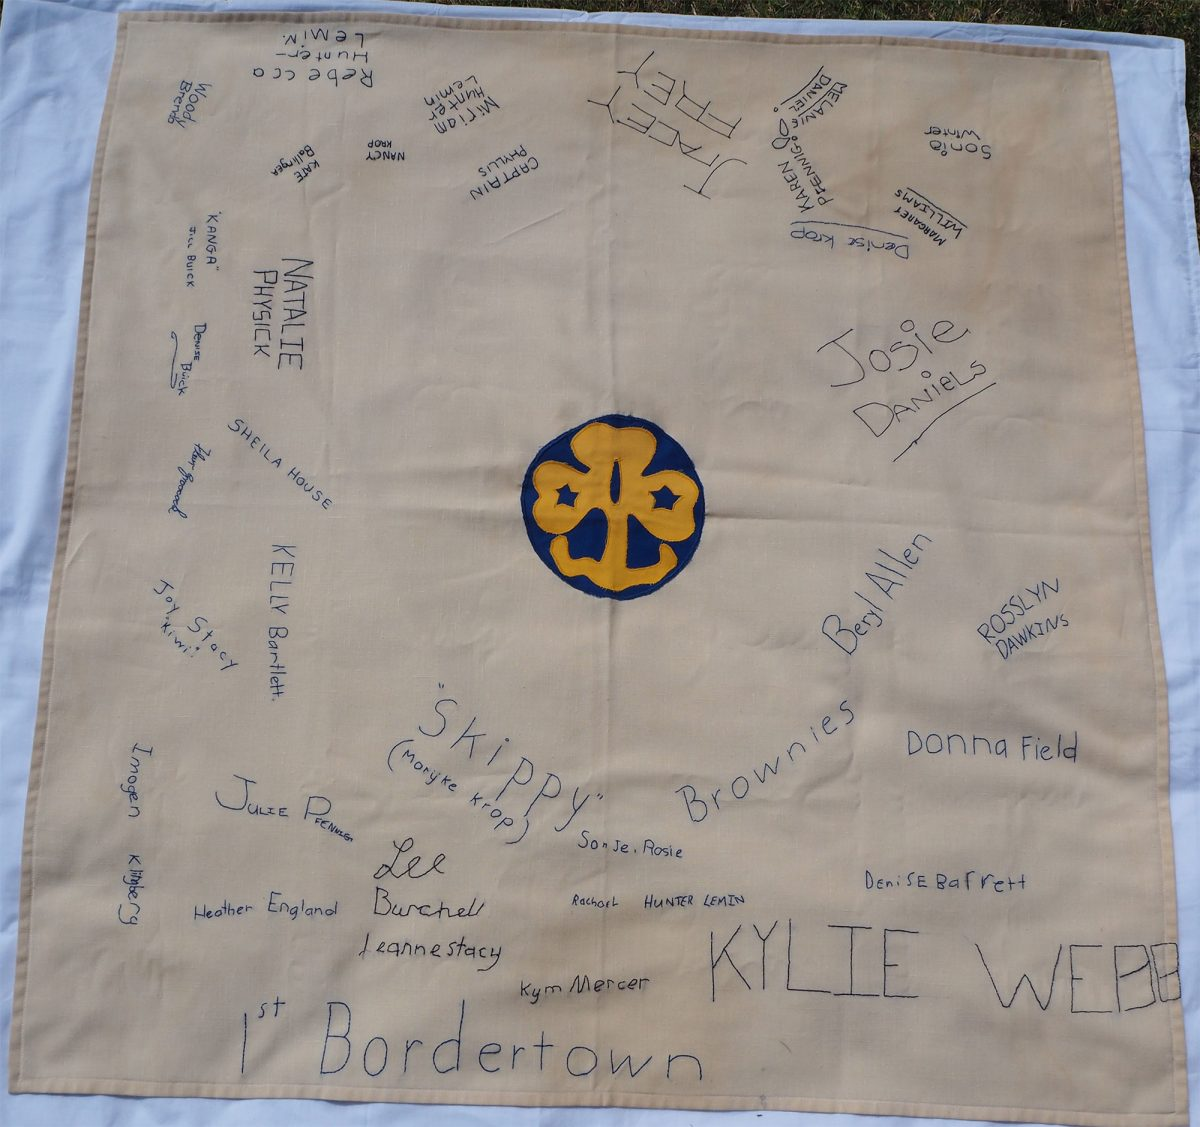 Girl Guides SA. 1st Bordertown: Cloth